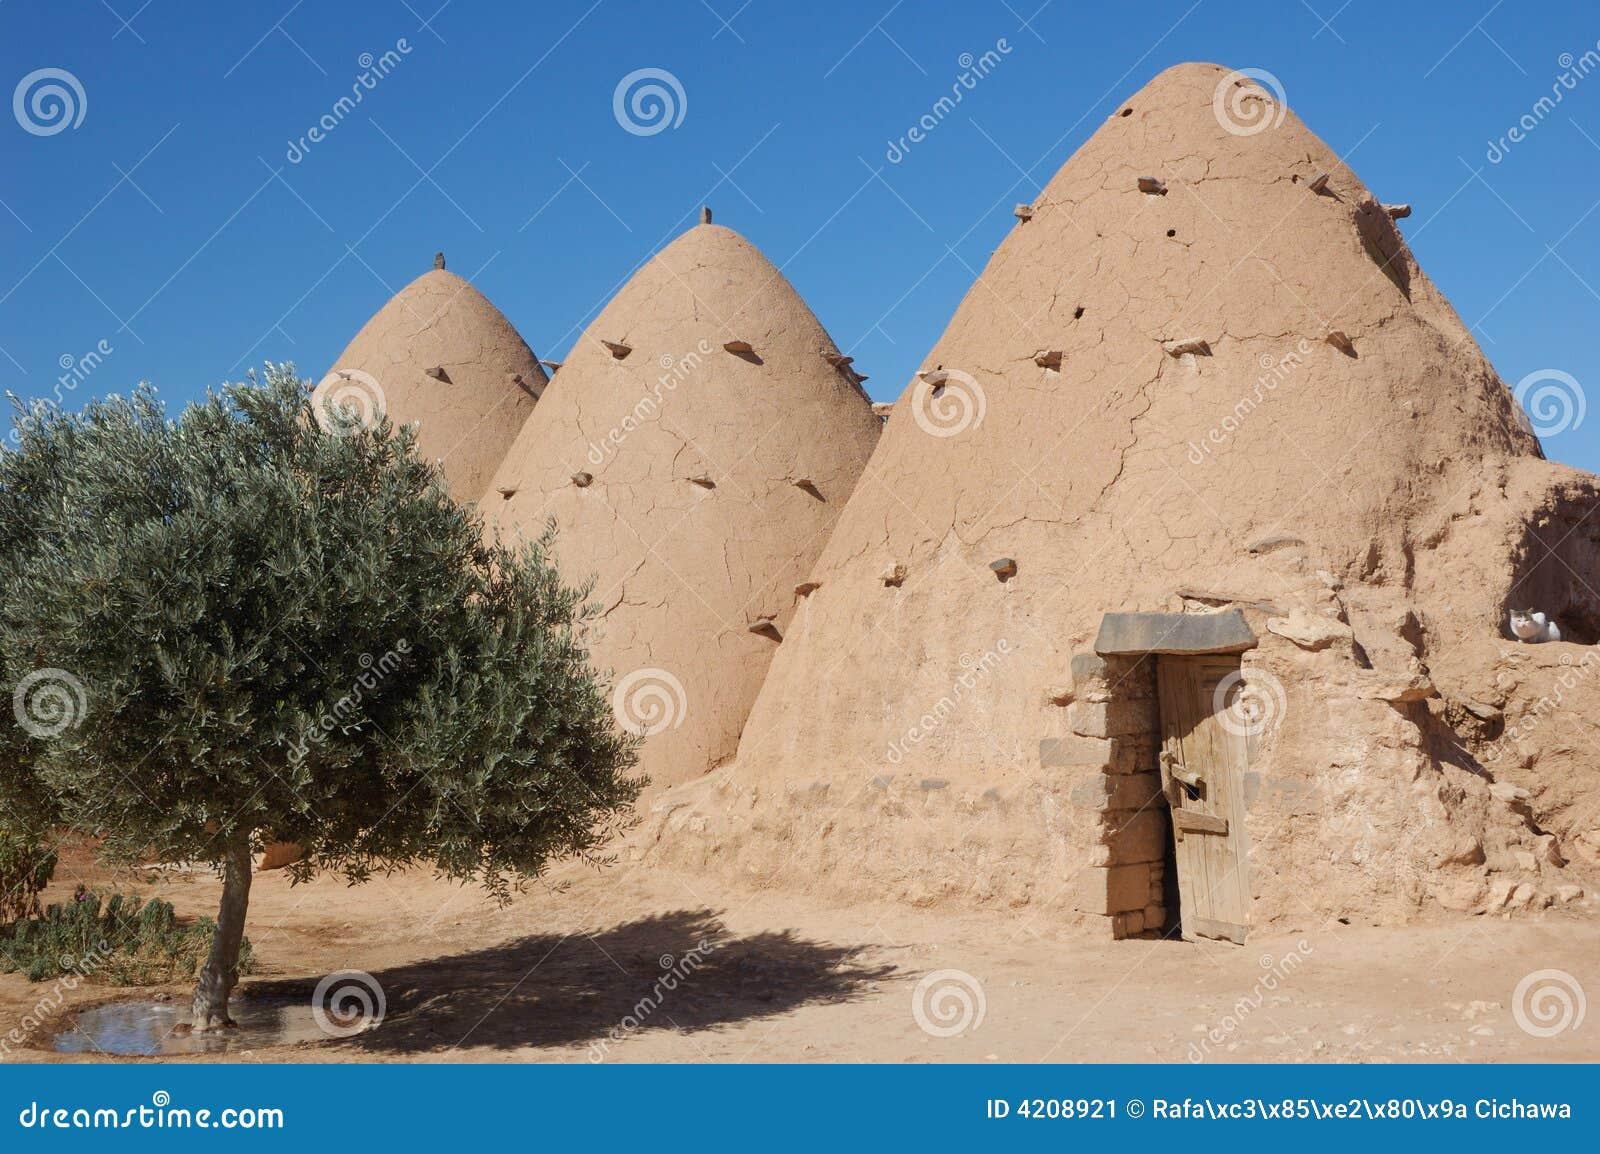 Syrië-klei die op woestijn voortbouwt